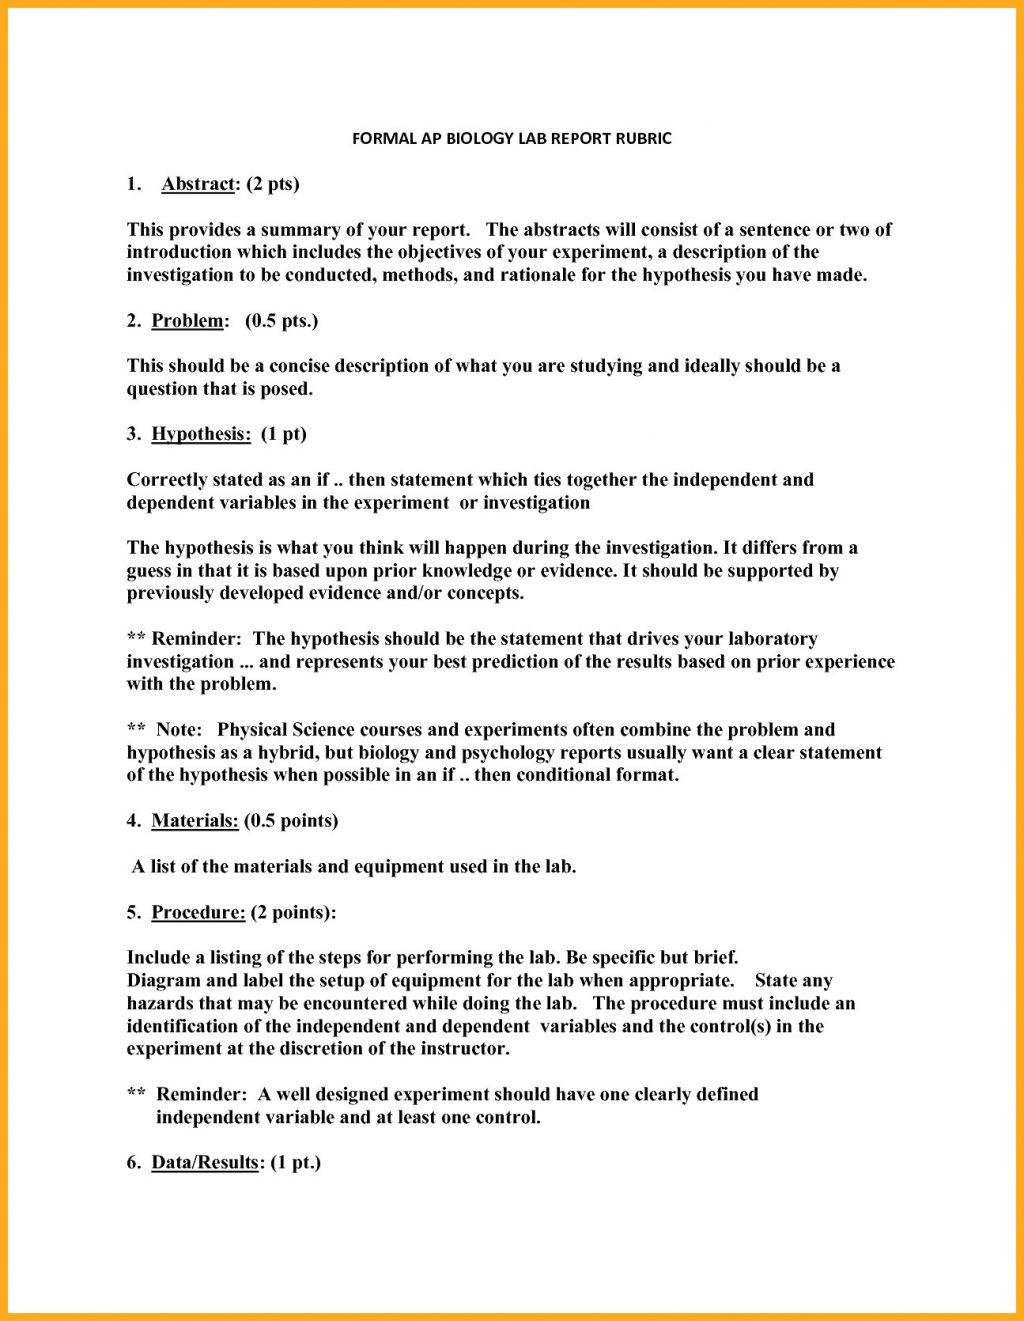 Biology Formal Lab Report Template Bio Sample Proper Format Ib With Regard To Biology Lab Report Template